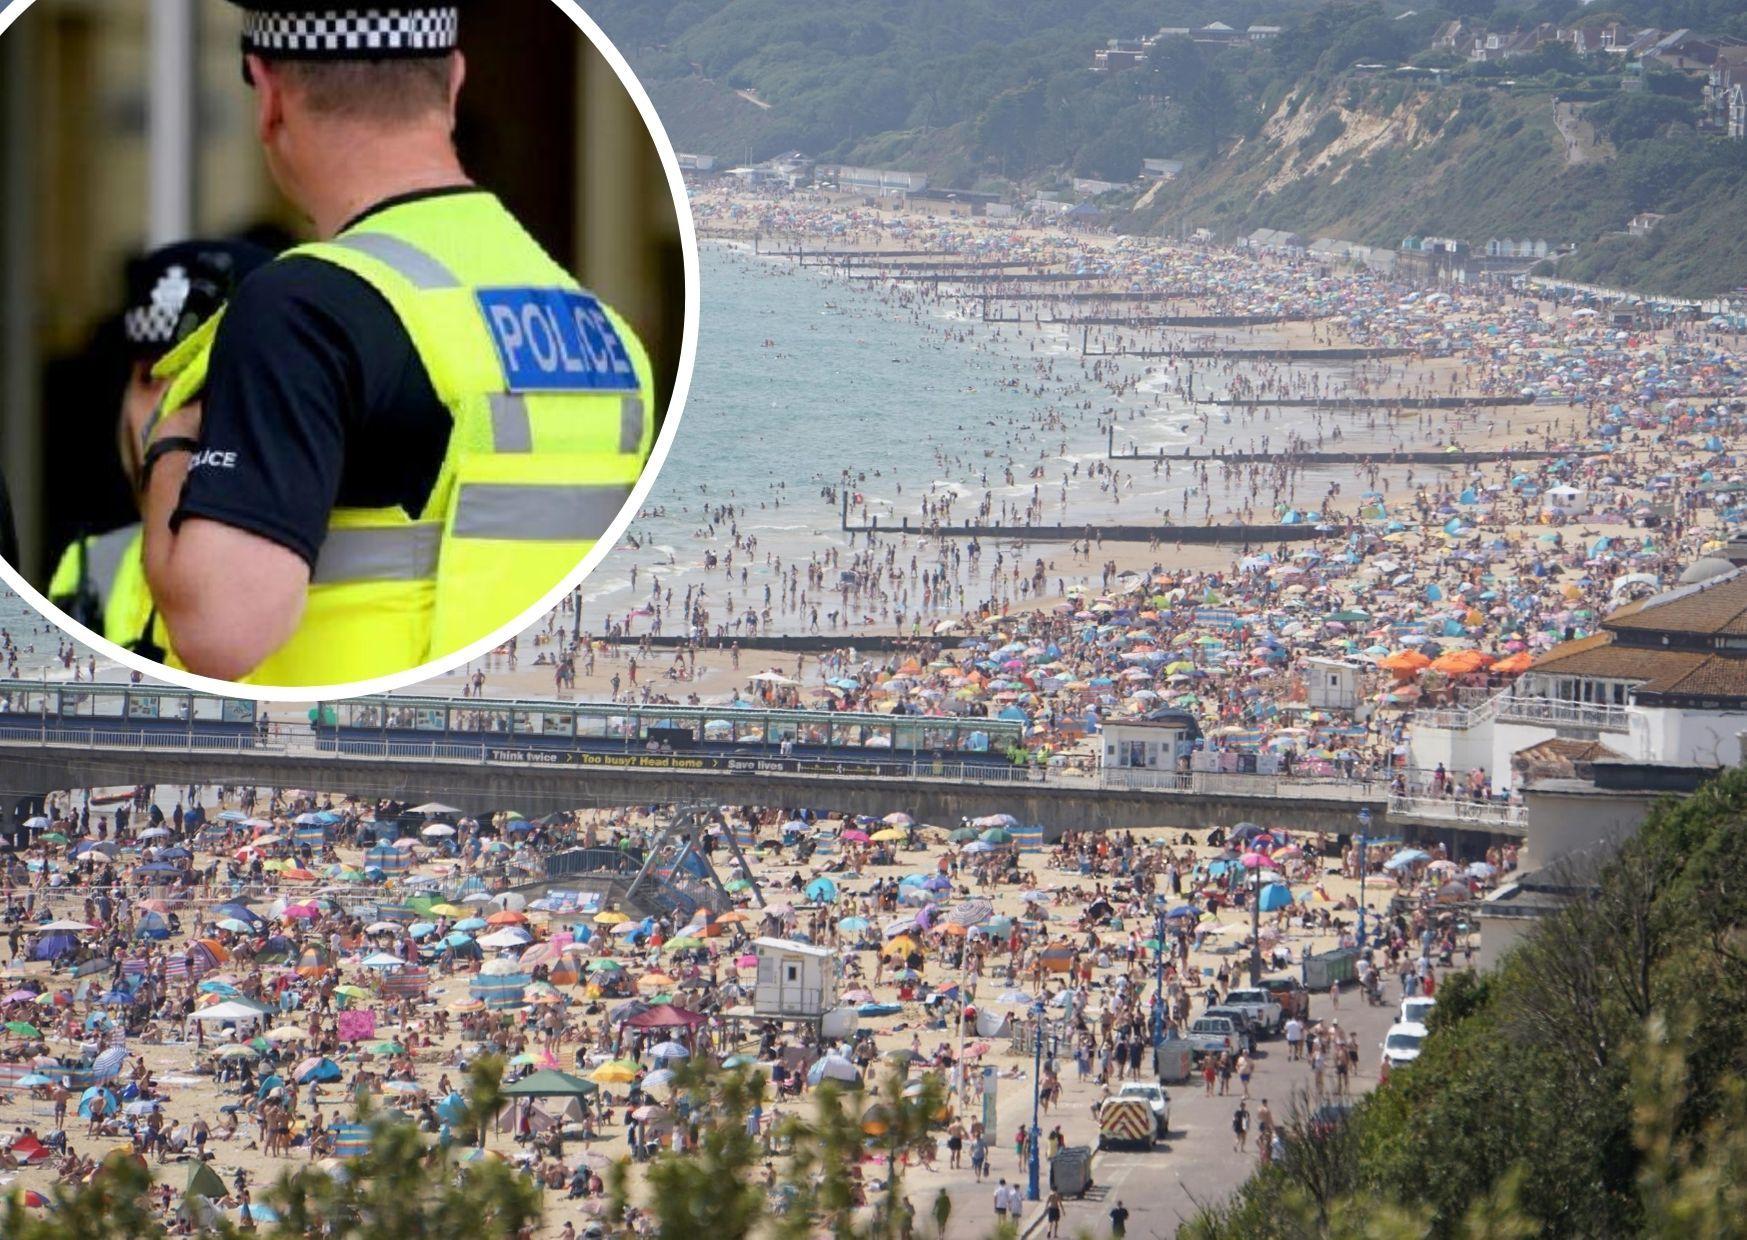 Police use PAVA spray to disperse crowds on Bournemouth beach